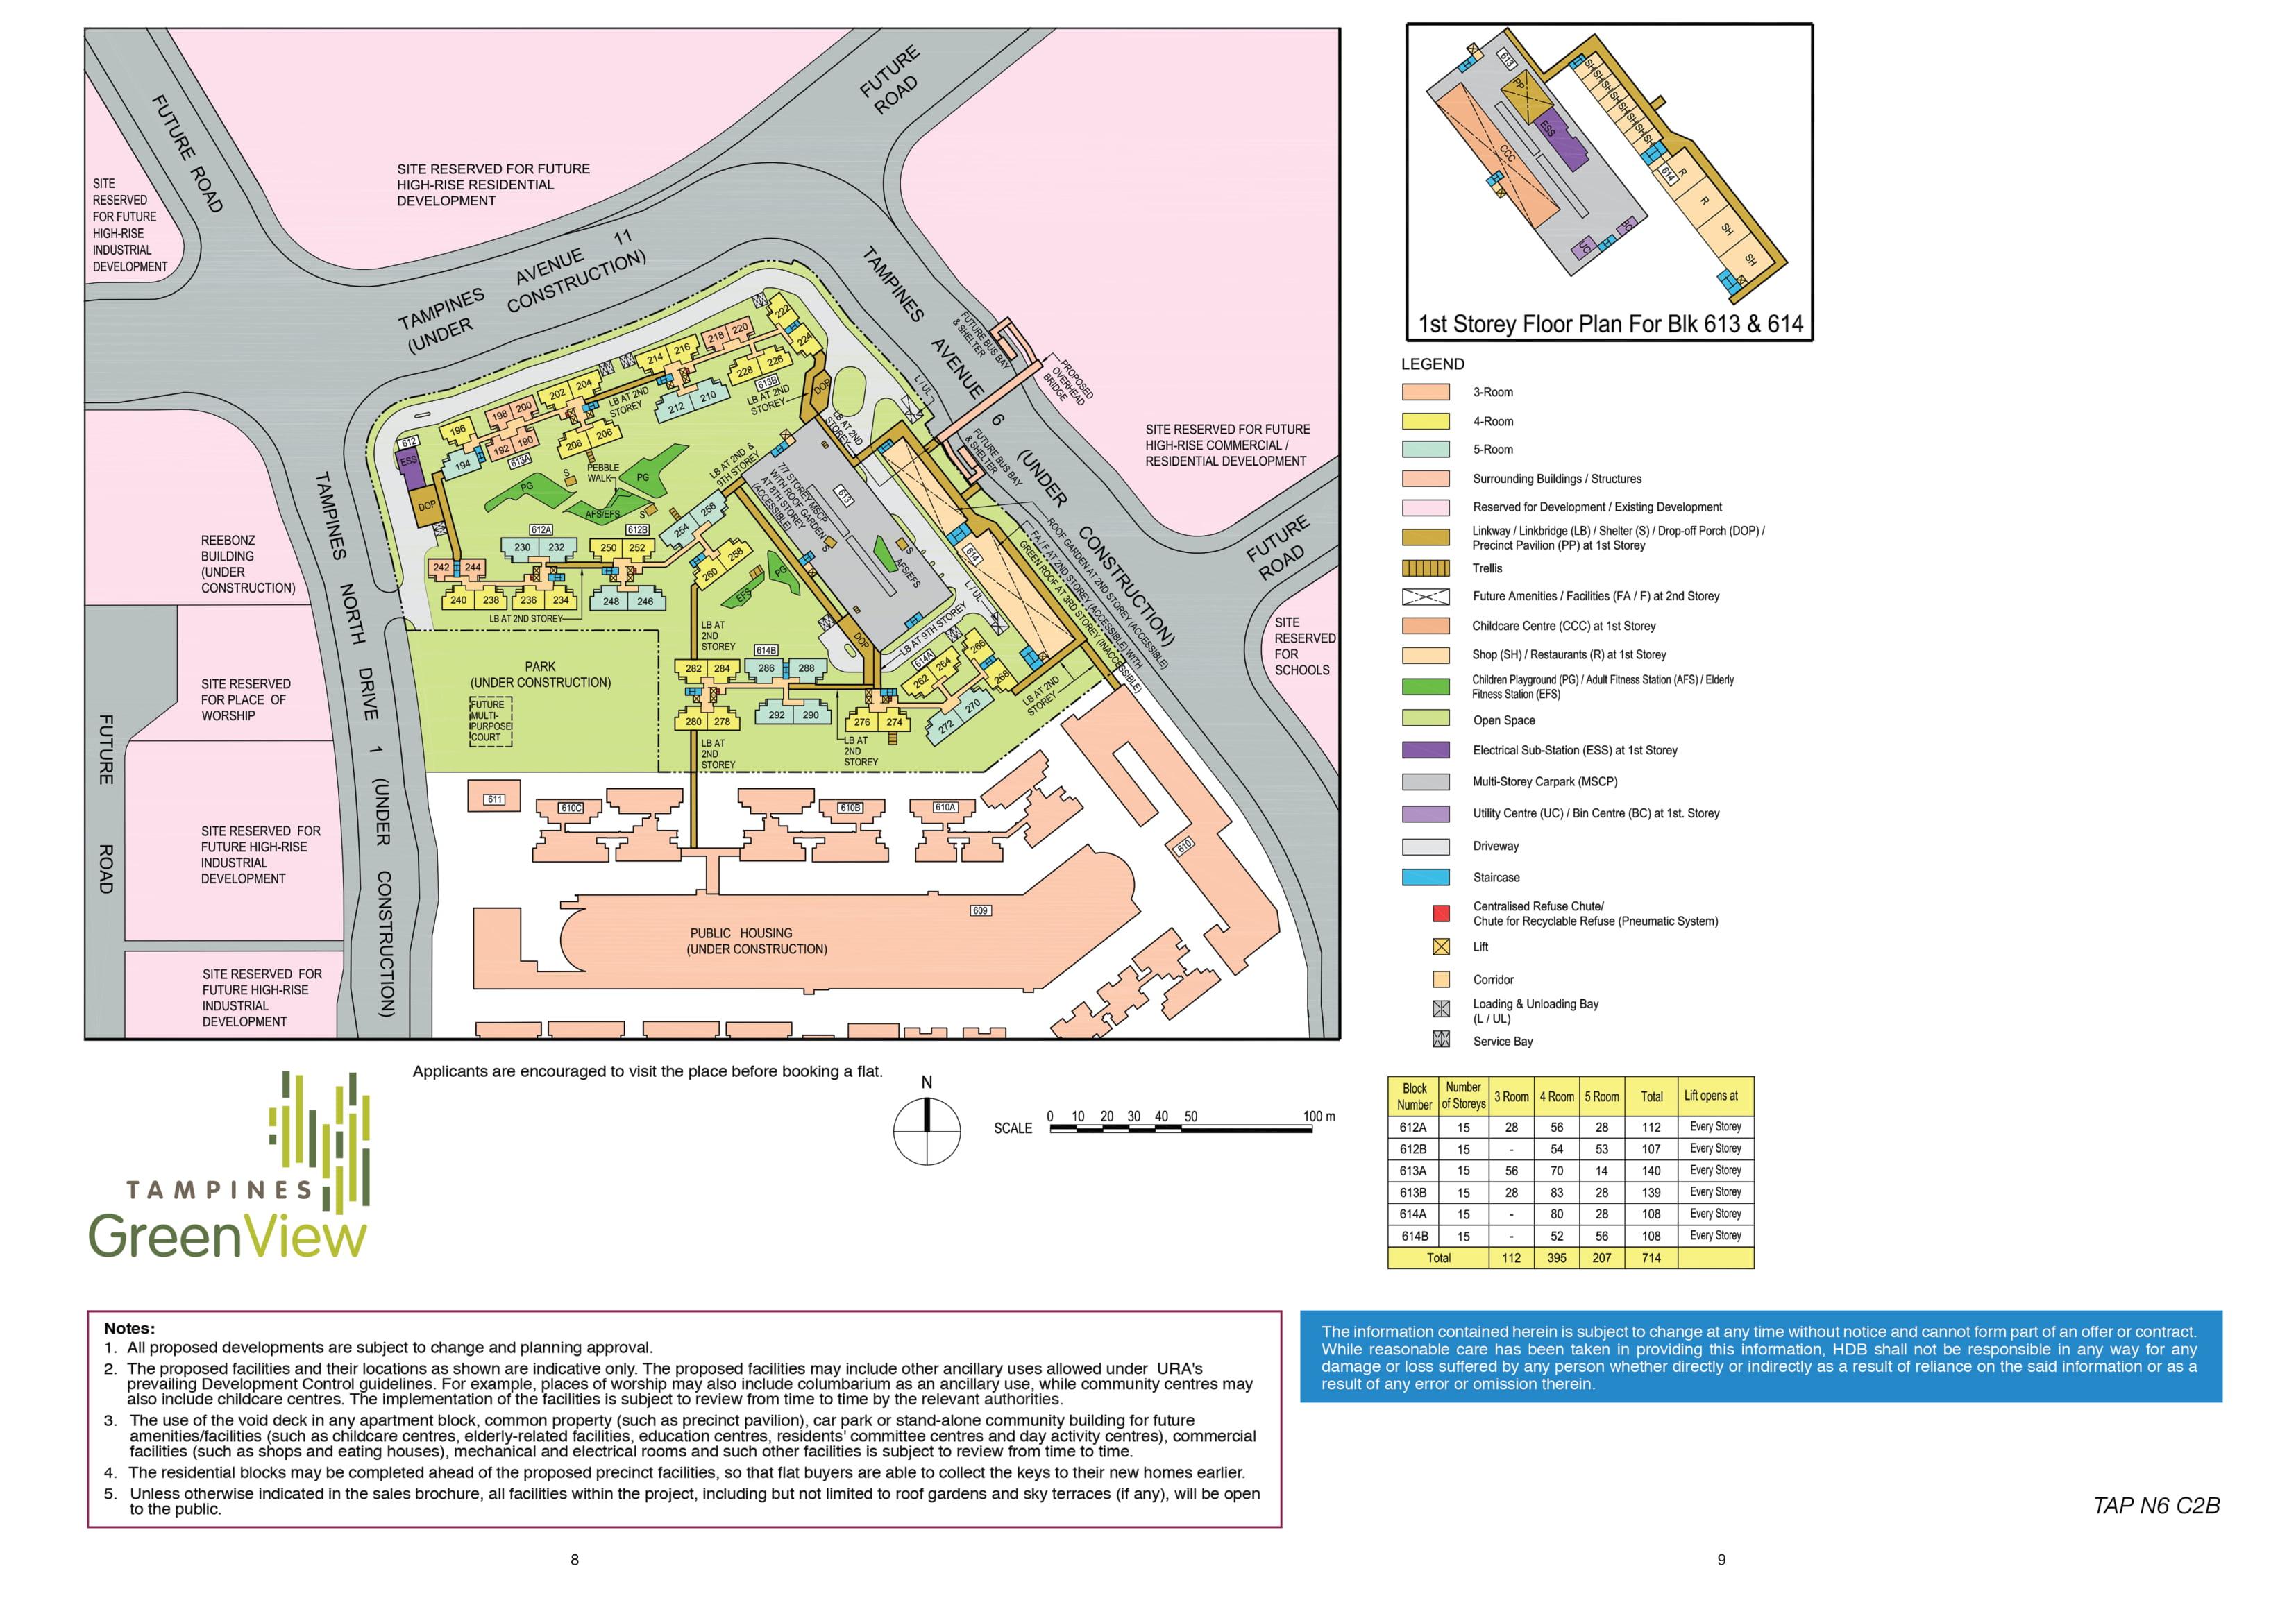 Tampines GreenView Site Plan